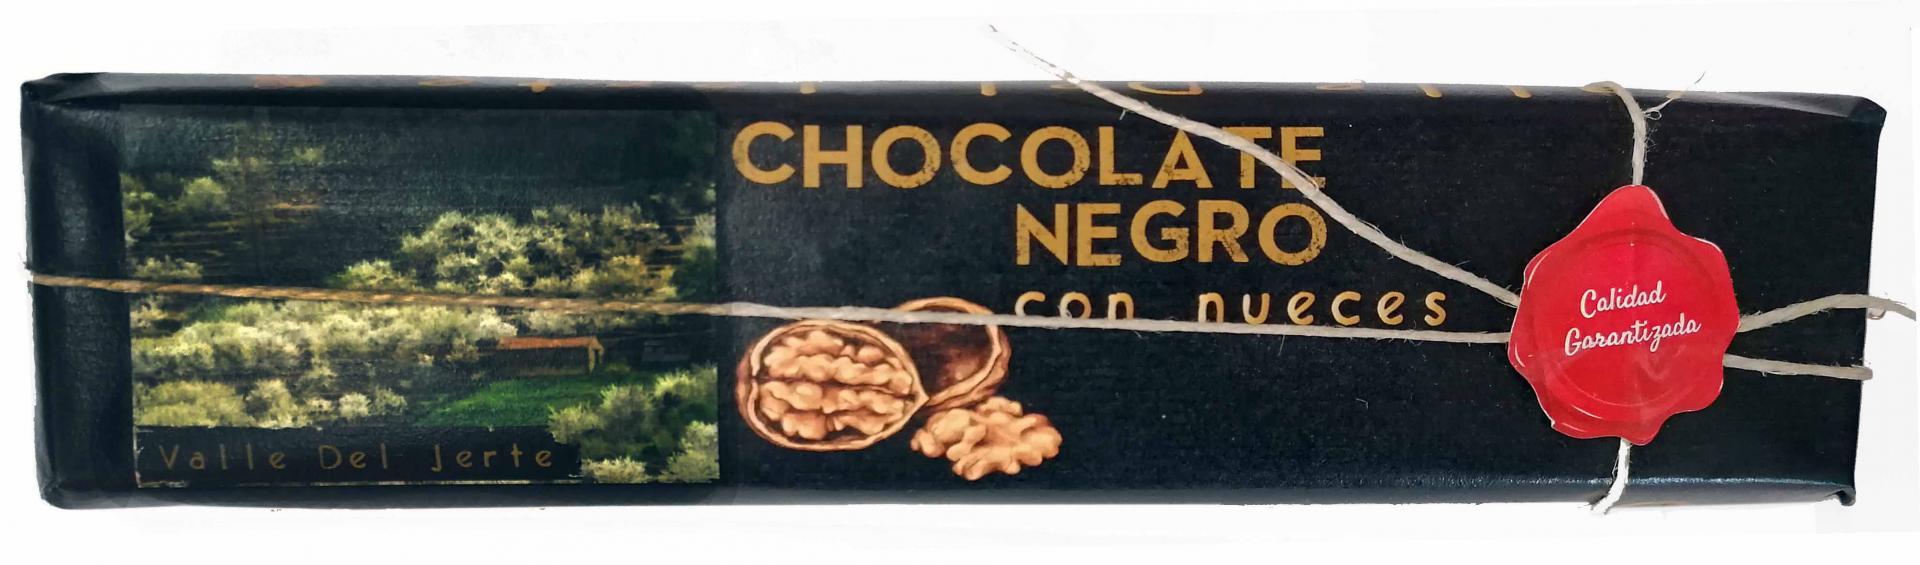 Chocolate negro con nueces Valle del Jerte